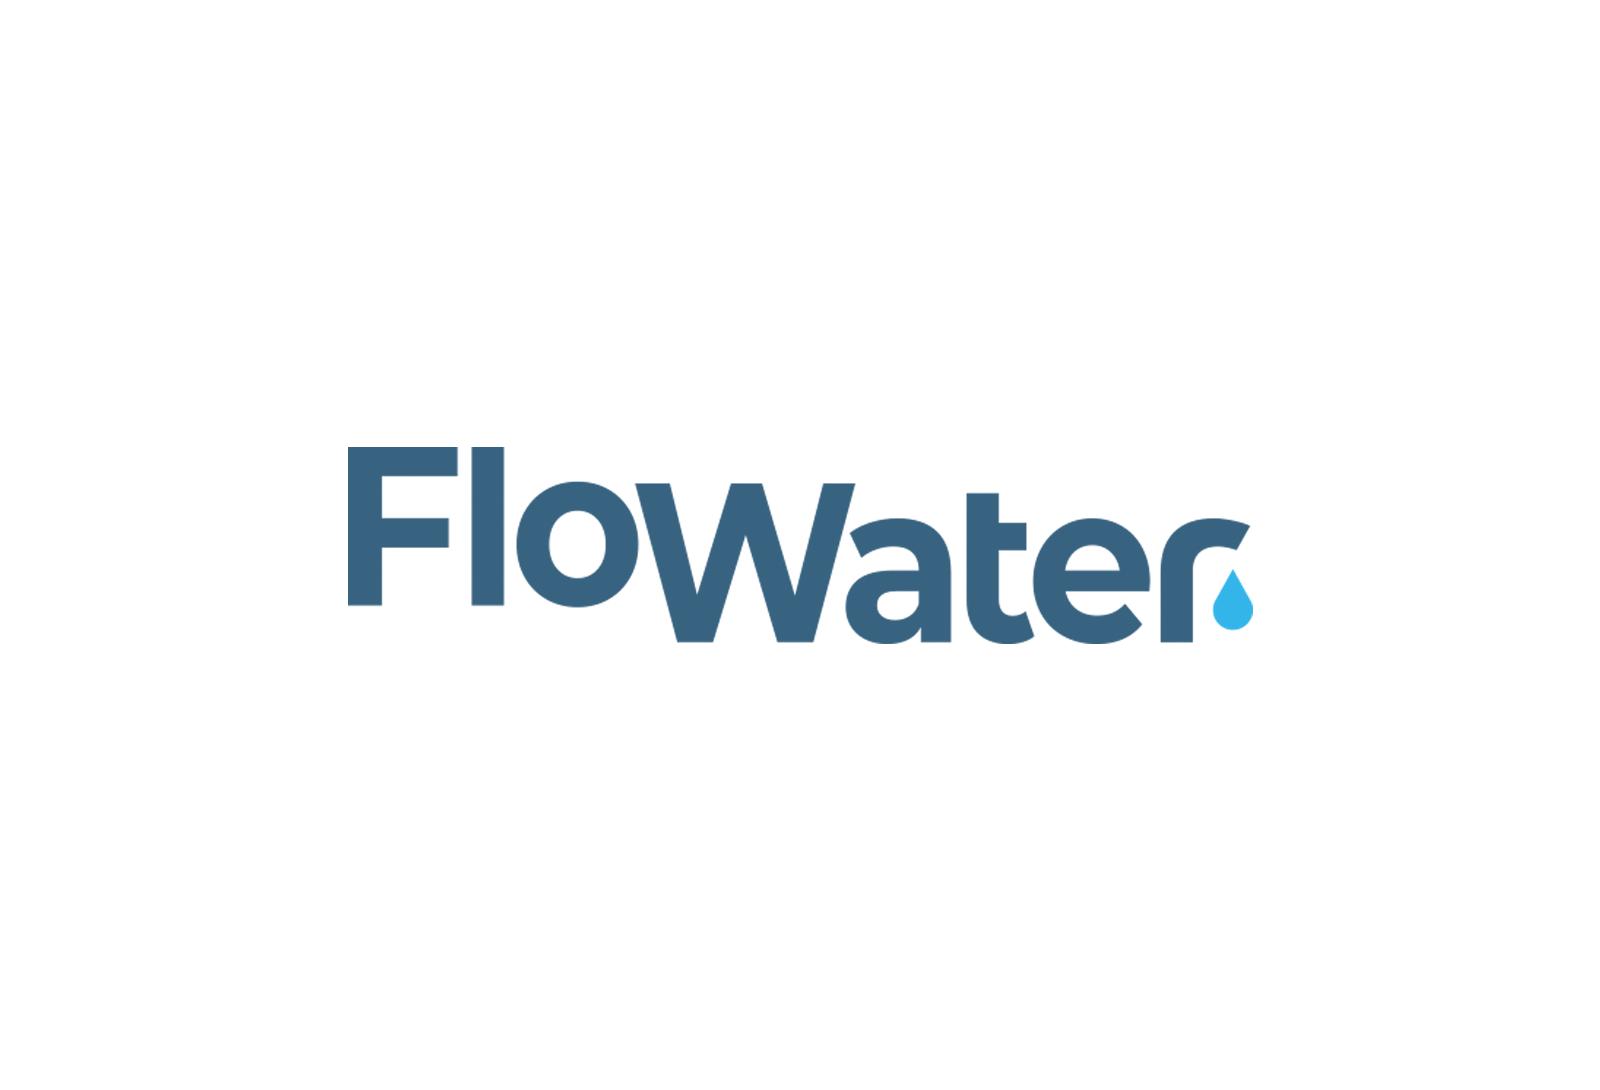 Flowater